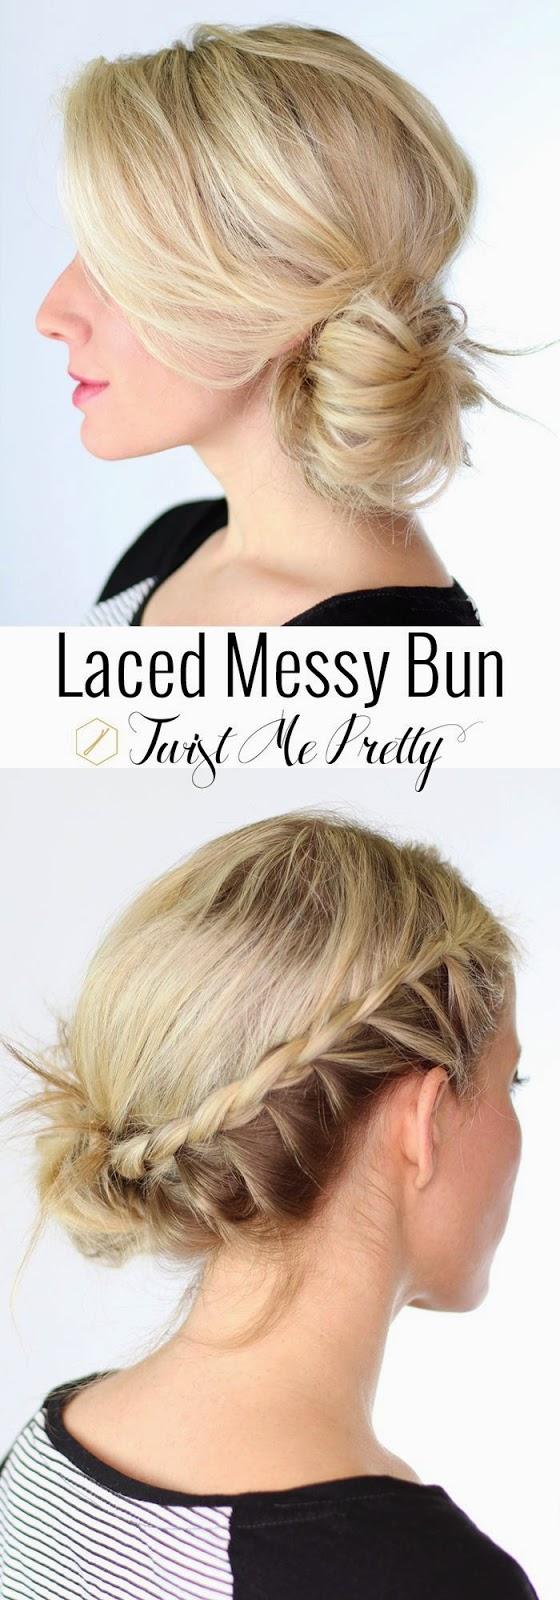 1001 Ideas Para Tu Peinado De Novia O Invitada Quiero Una Boda - Peinados-novia-boda